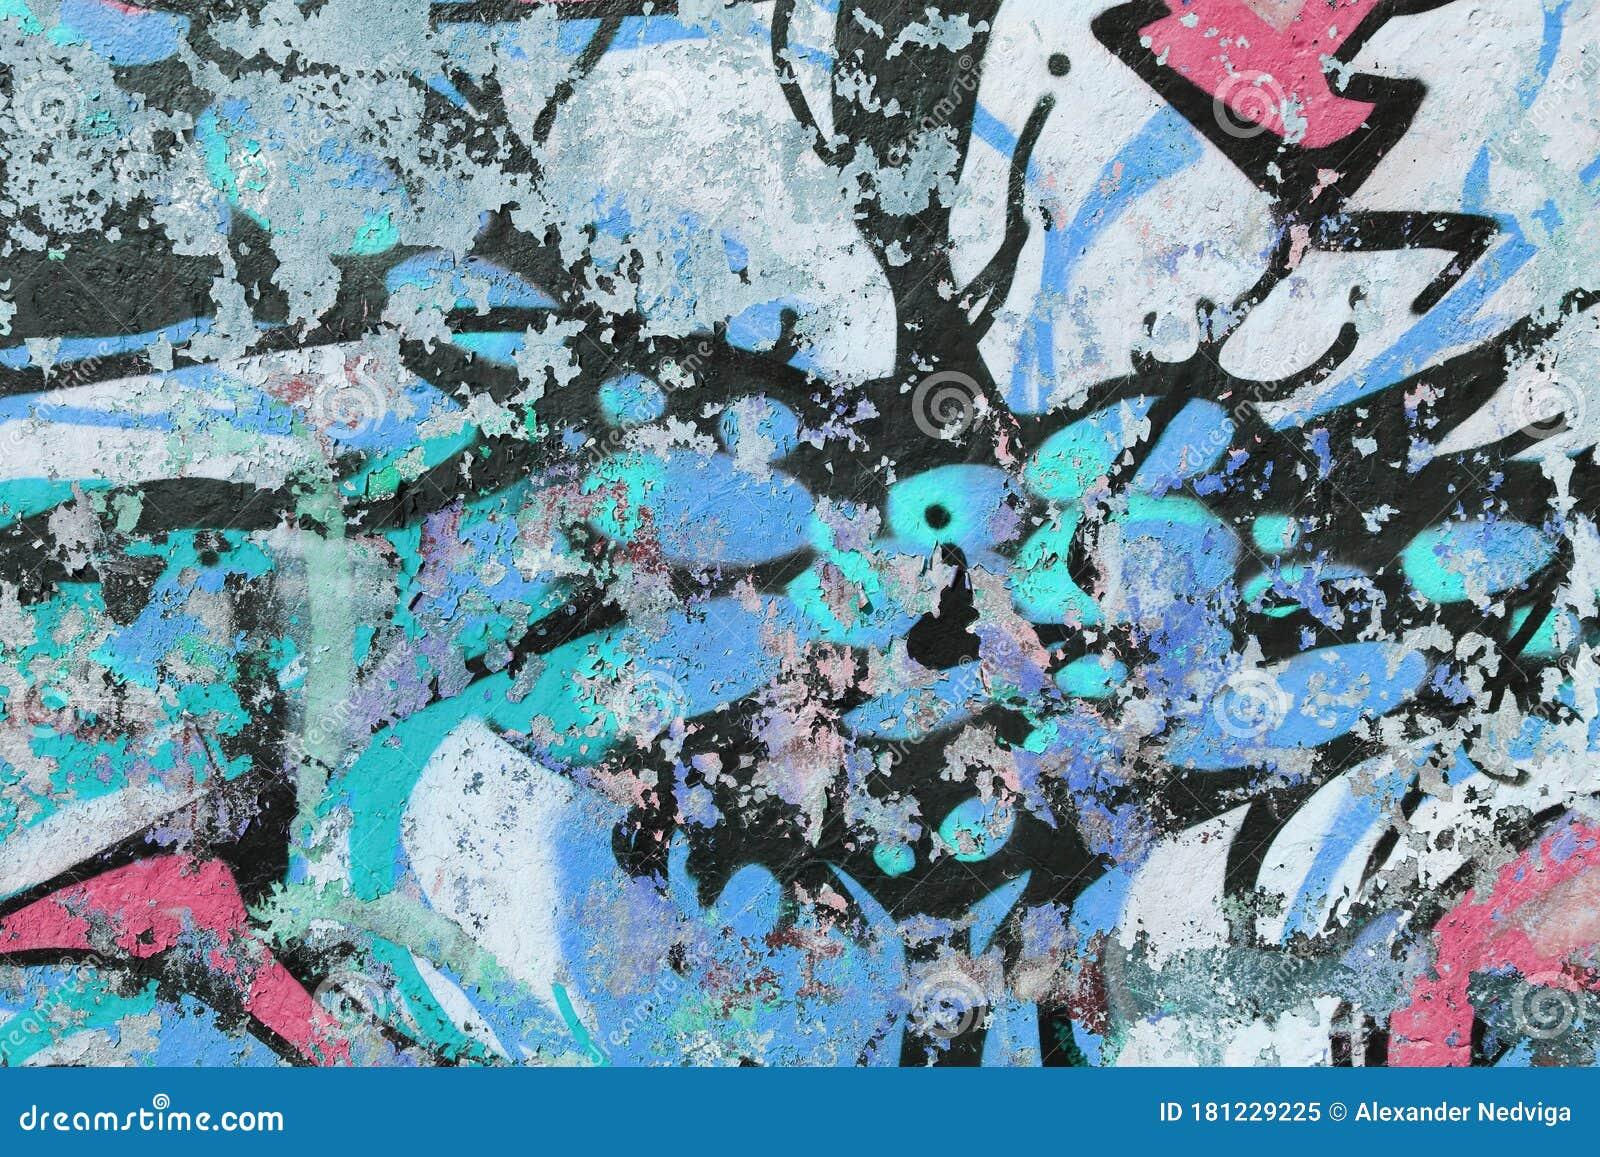 Fantastique Weathered Graffiti Wall. Urban Street Art Beauty. Texture AJ-12